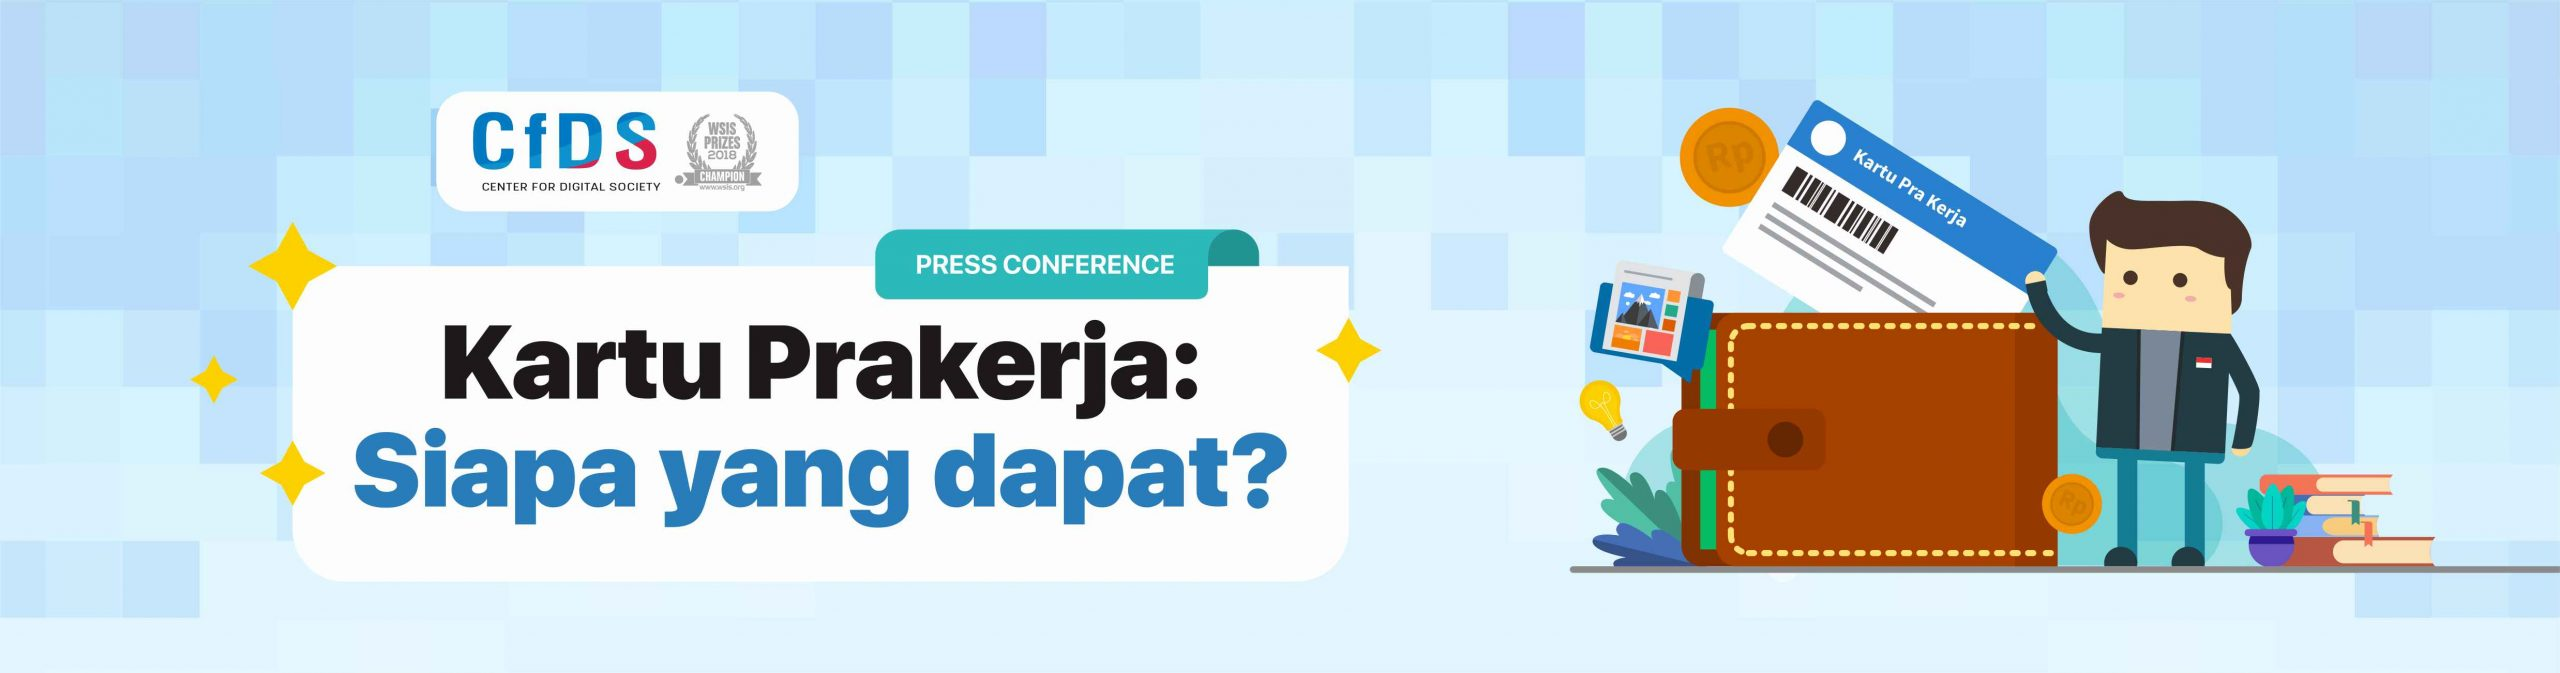 Press Release Kartu Prakerja Who Can Get It Press Conference Center For Digital Society